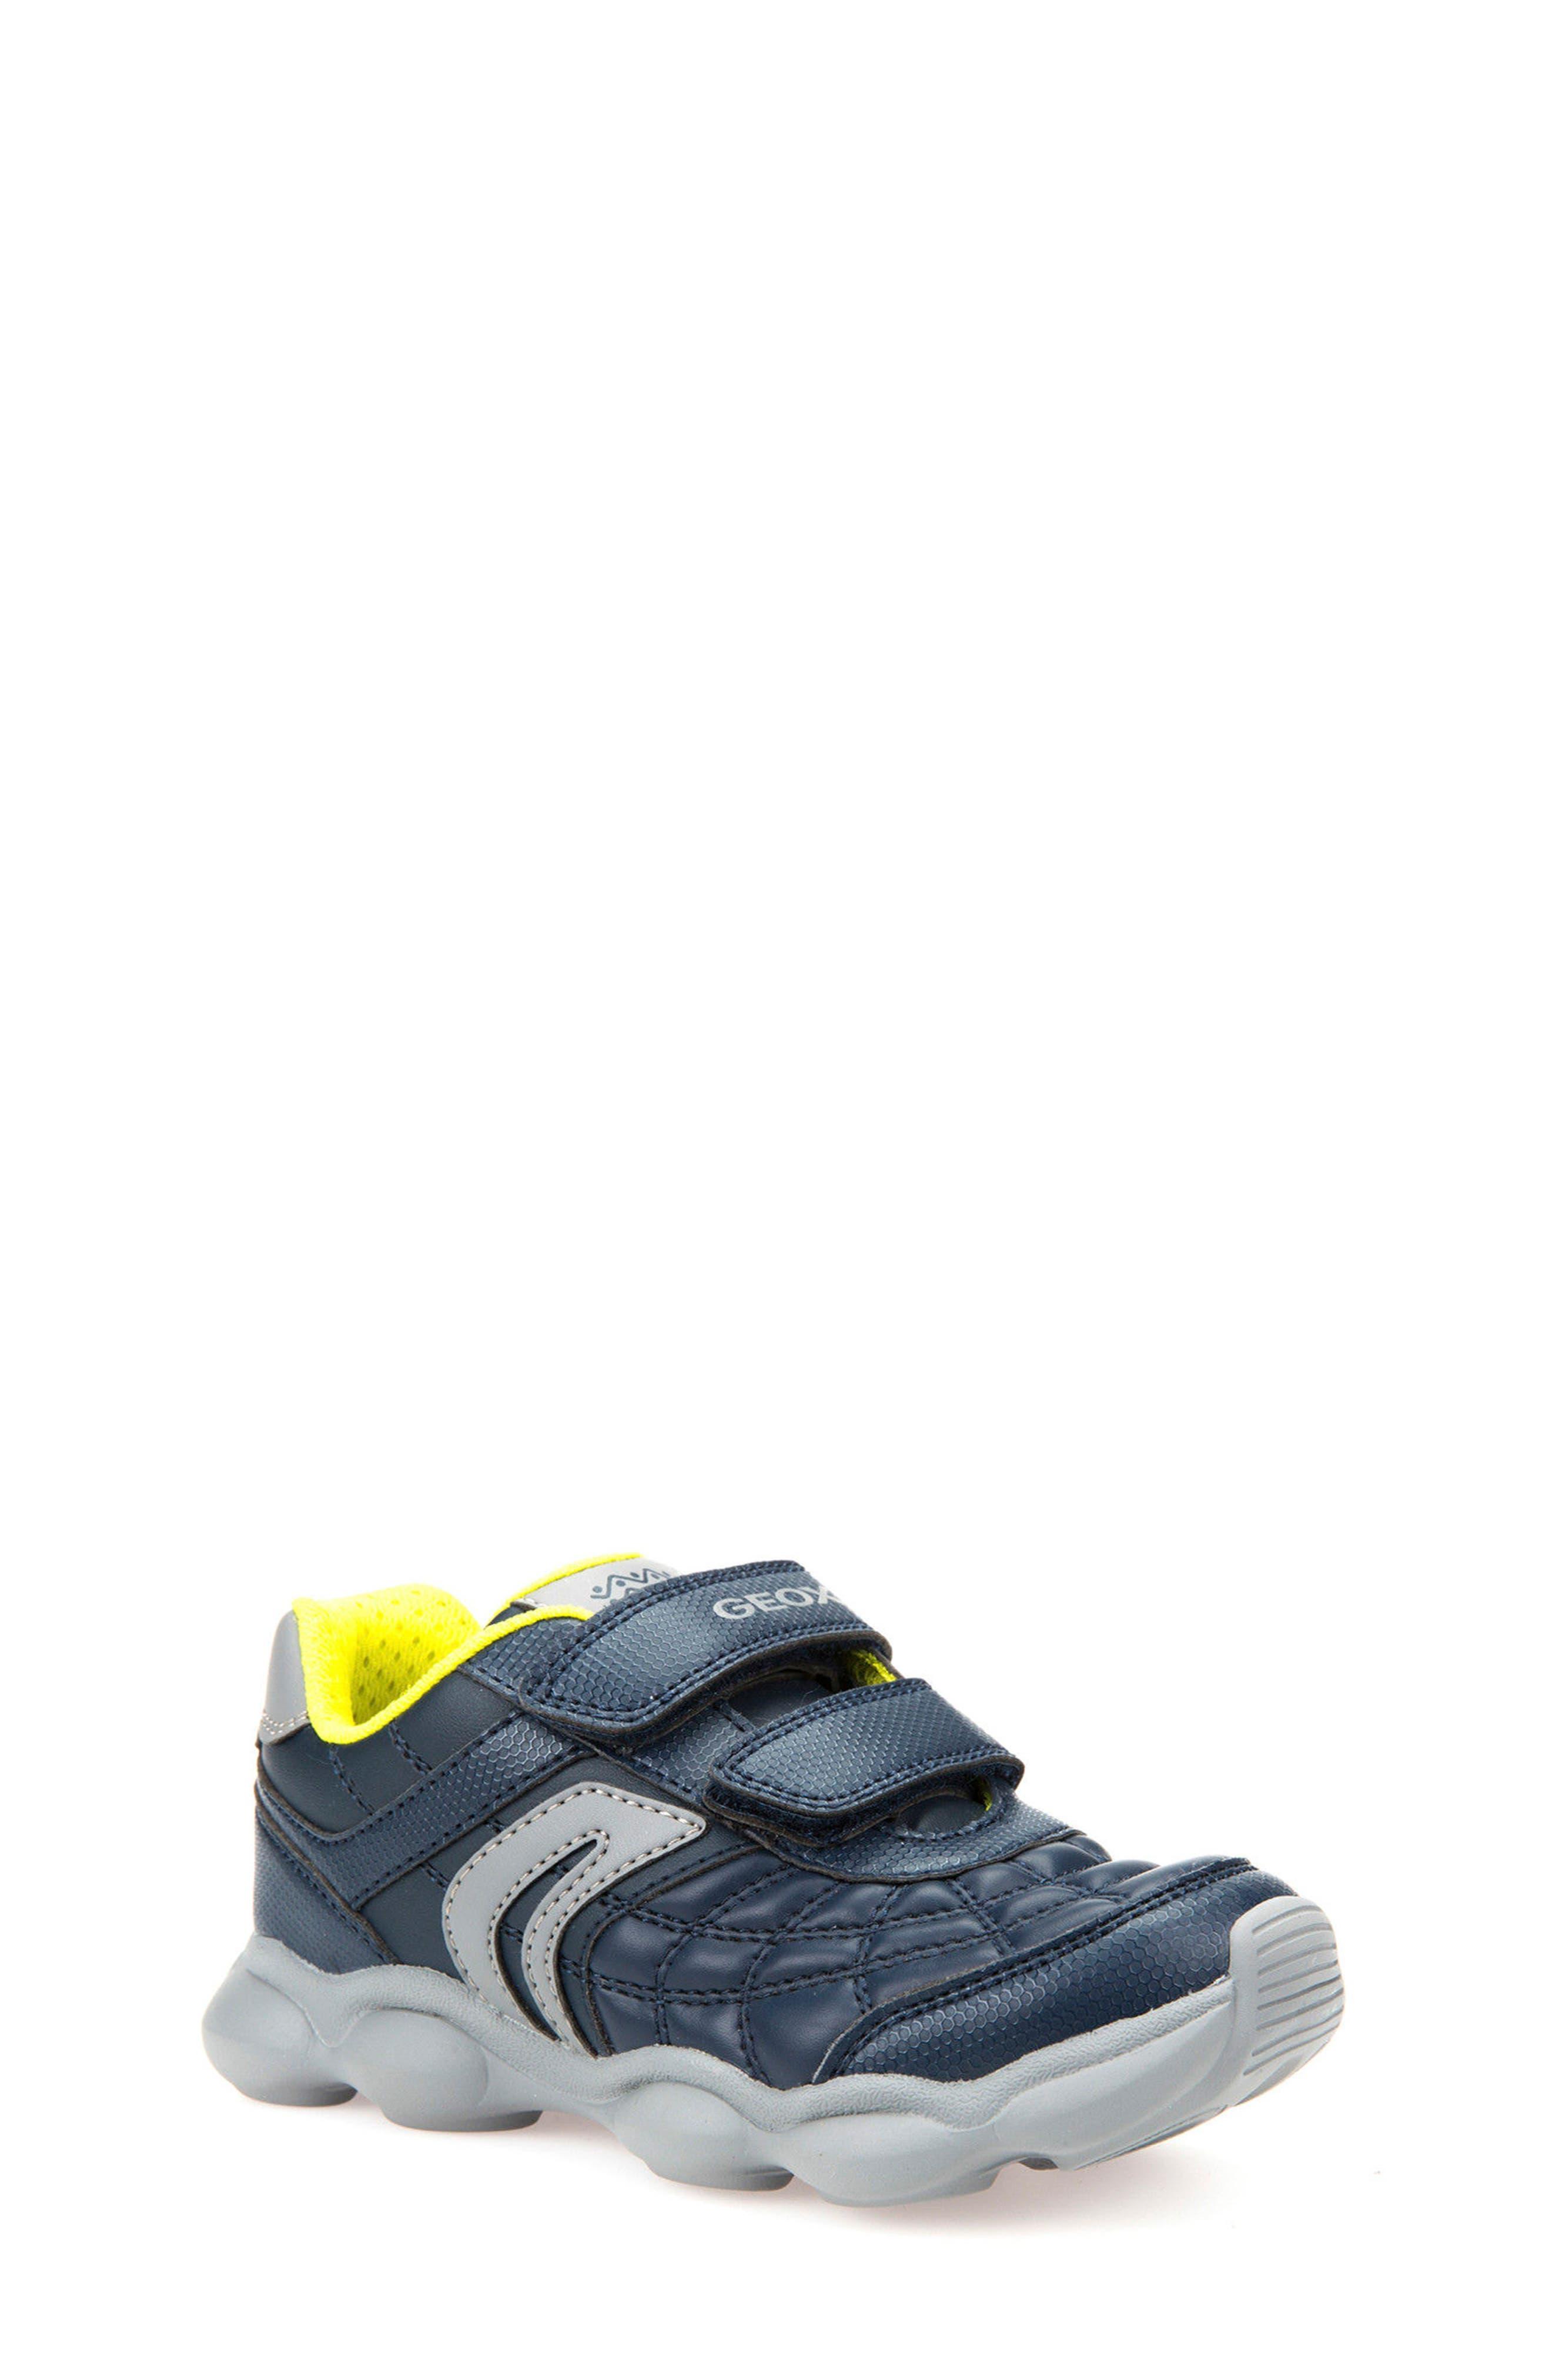 Munfrey Sneaker,                             Main thumbnail 1, color,                             Navy/ Grey